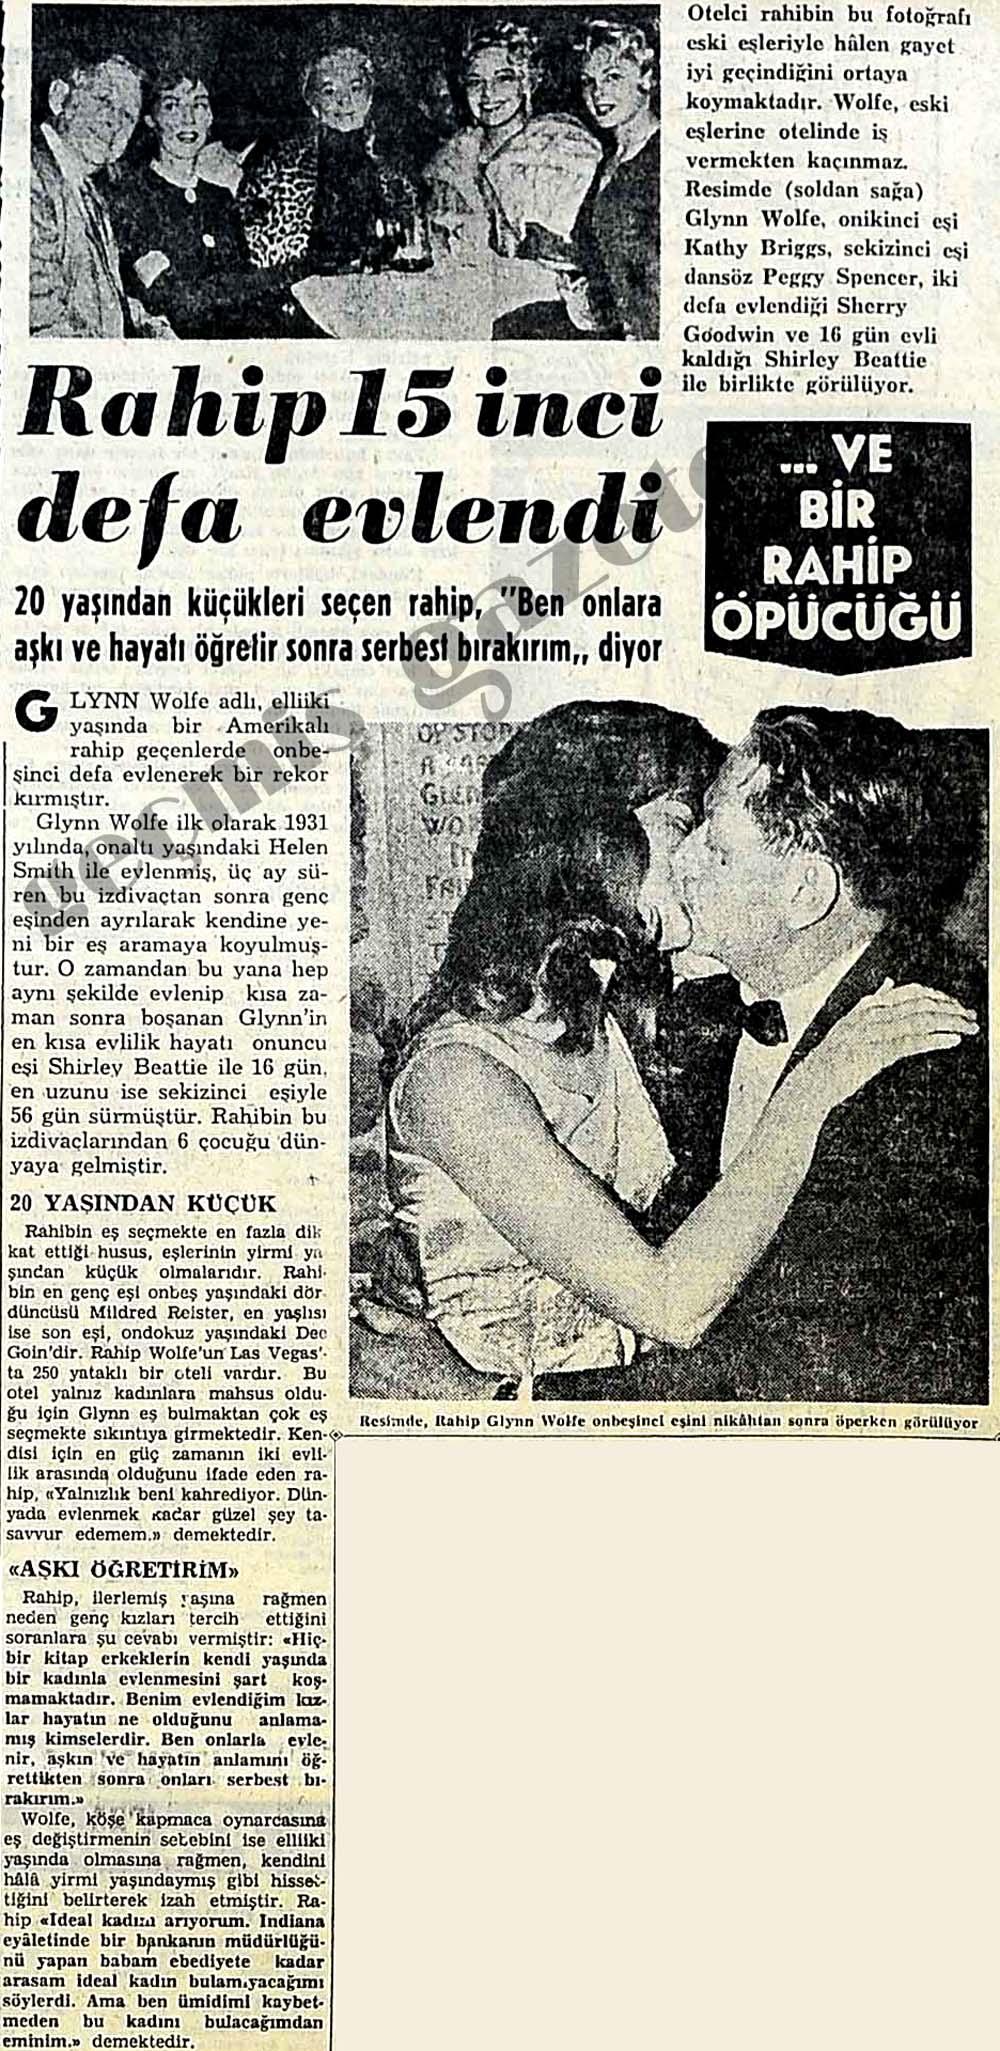 Rahip 15 inci defa evlendi